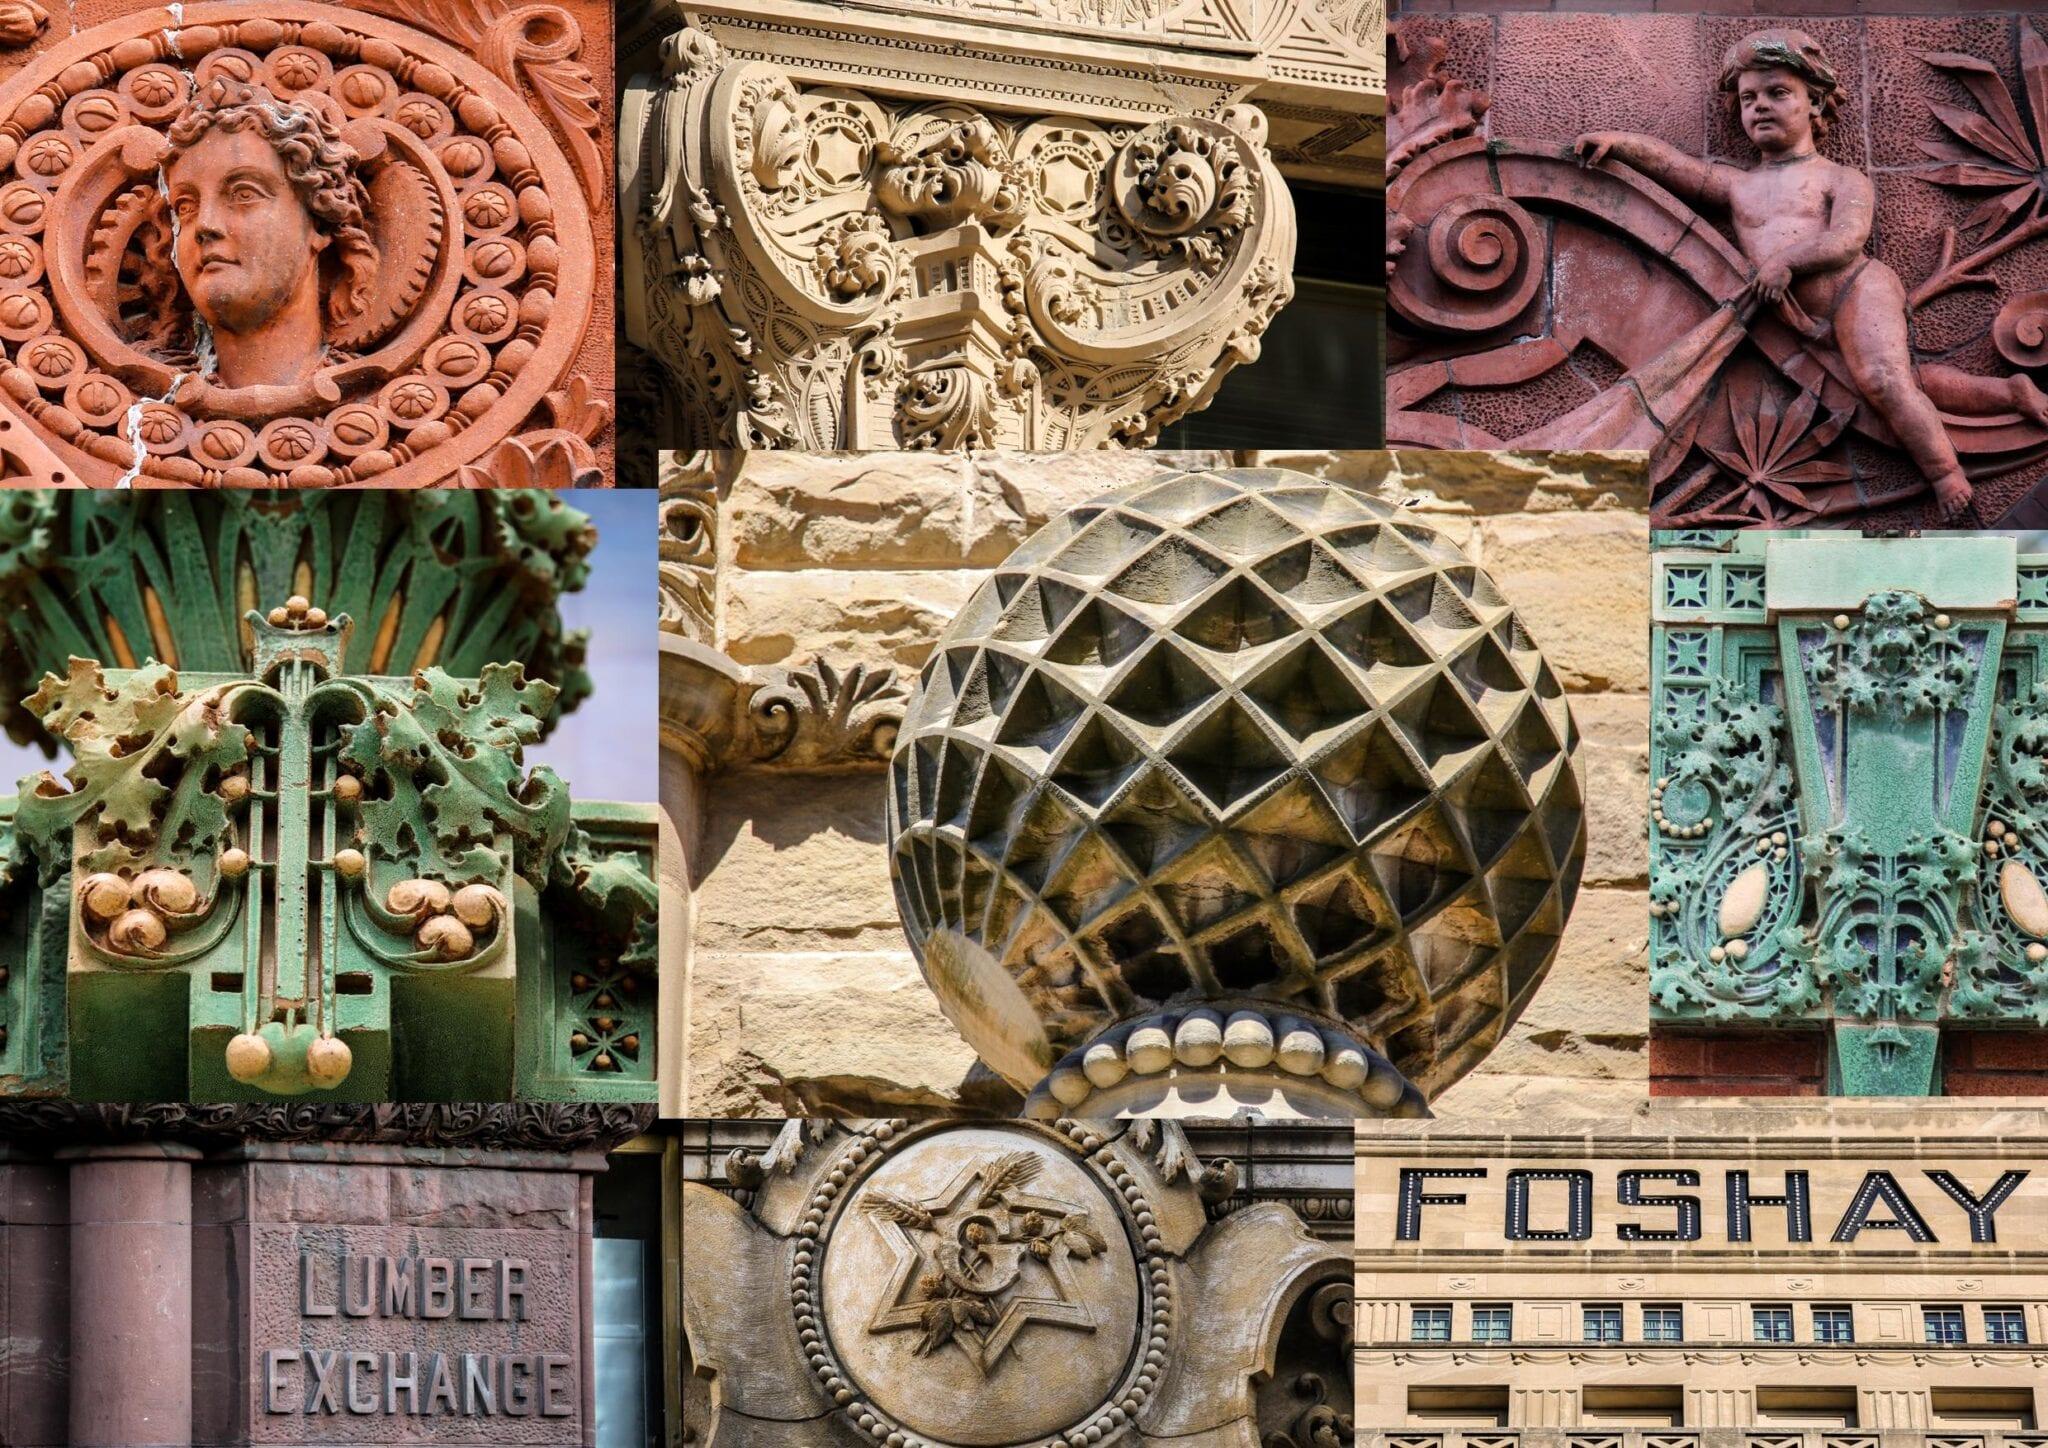 visiting merchants national bank foshay tower masonic temple